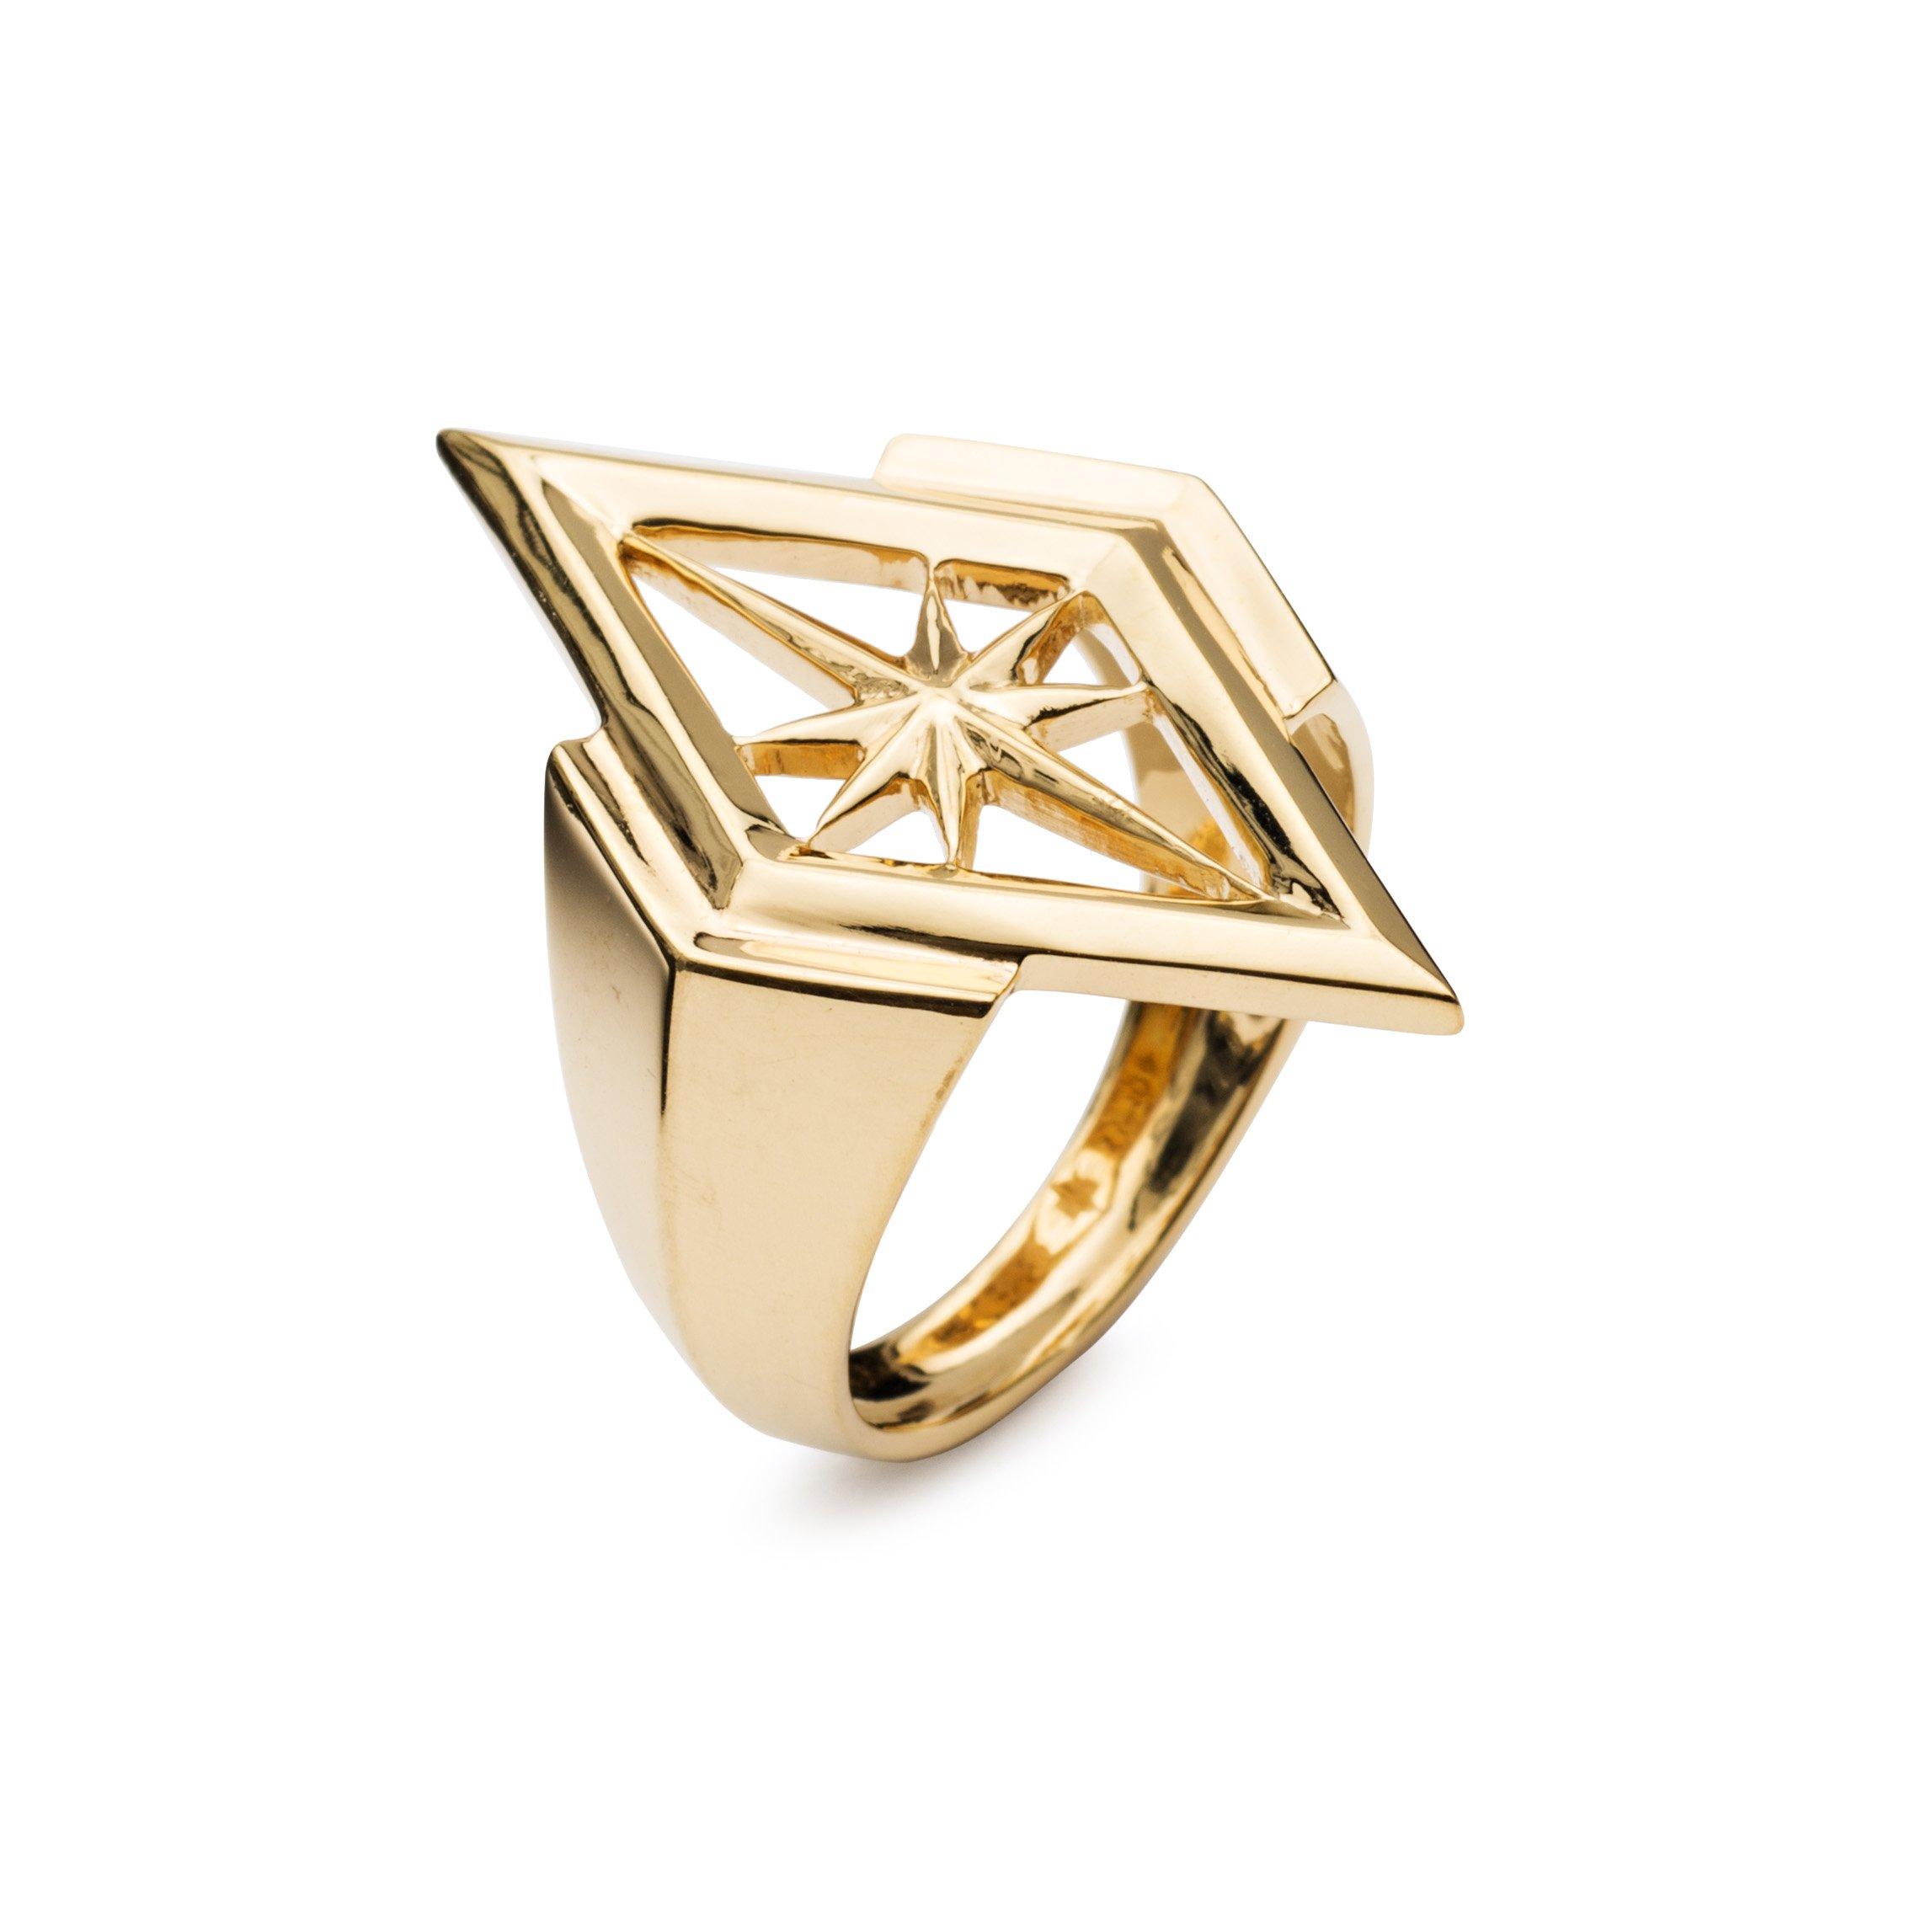 NOVA STAR RING - GOLD